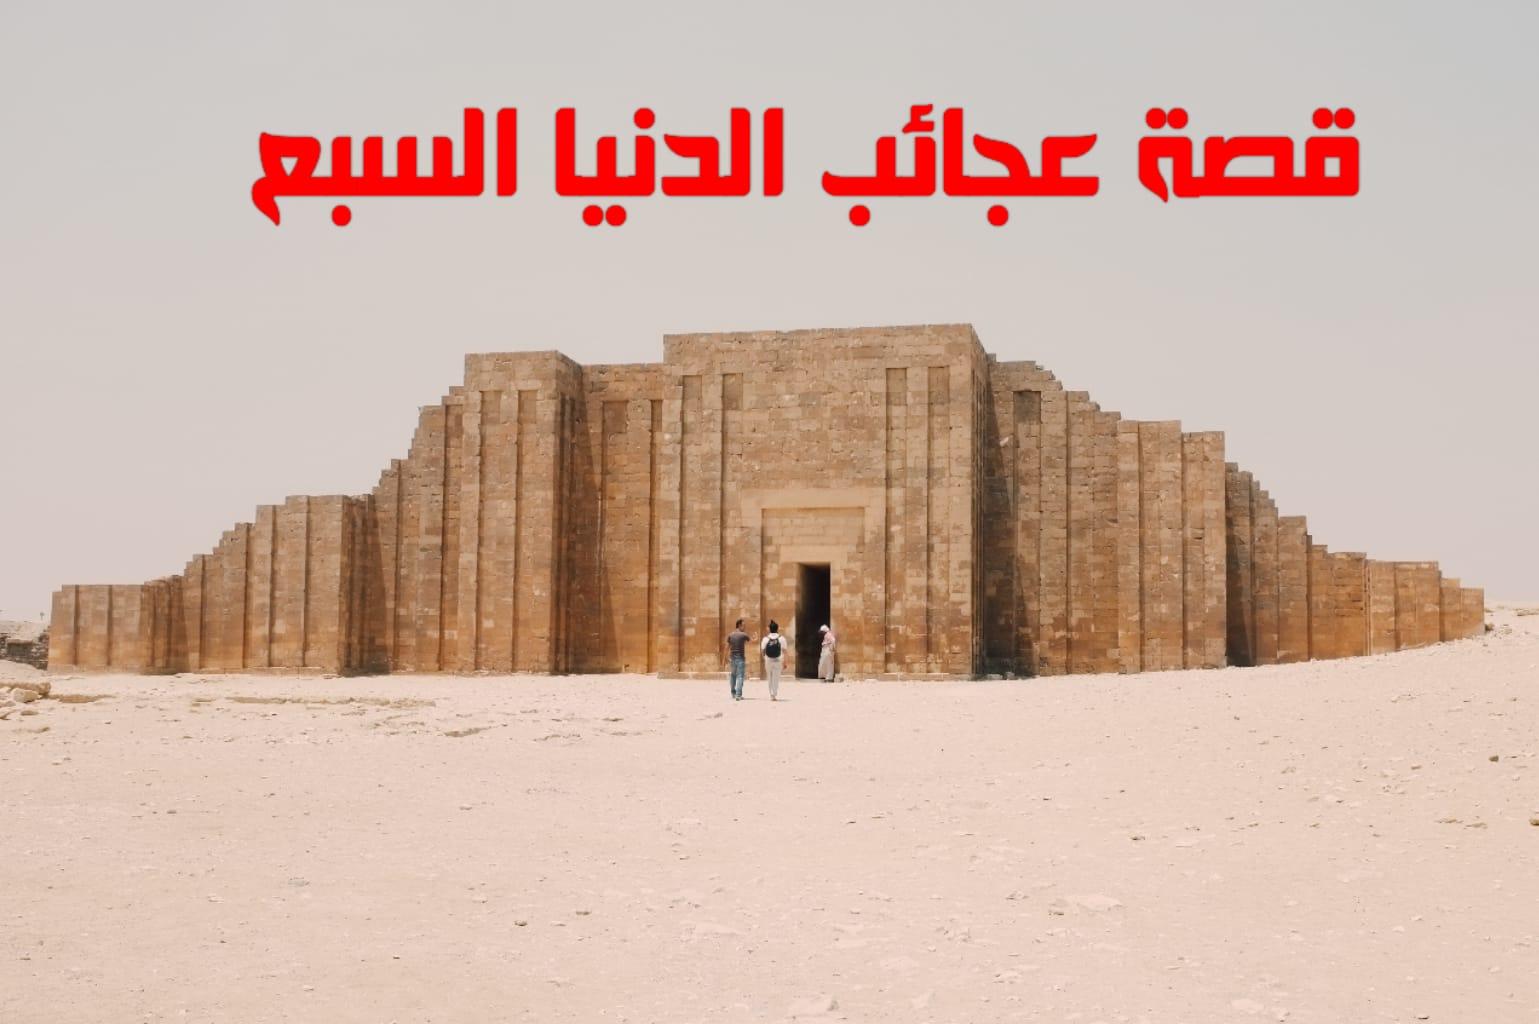 WhatsApp Image 2020 06 08 at 10.35.45 PM - عجائب الدنيا السبع الجديدة سميت وسط جدل